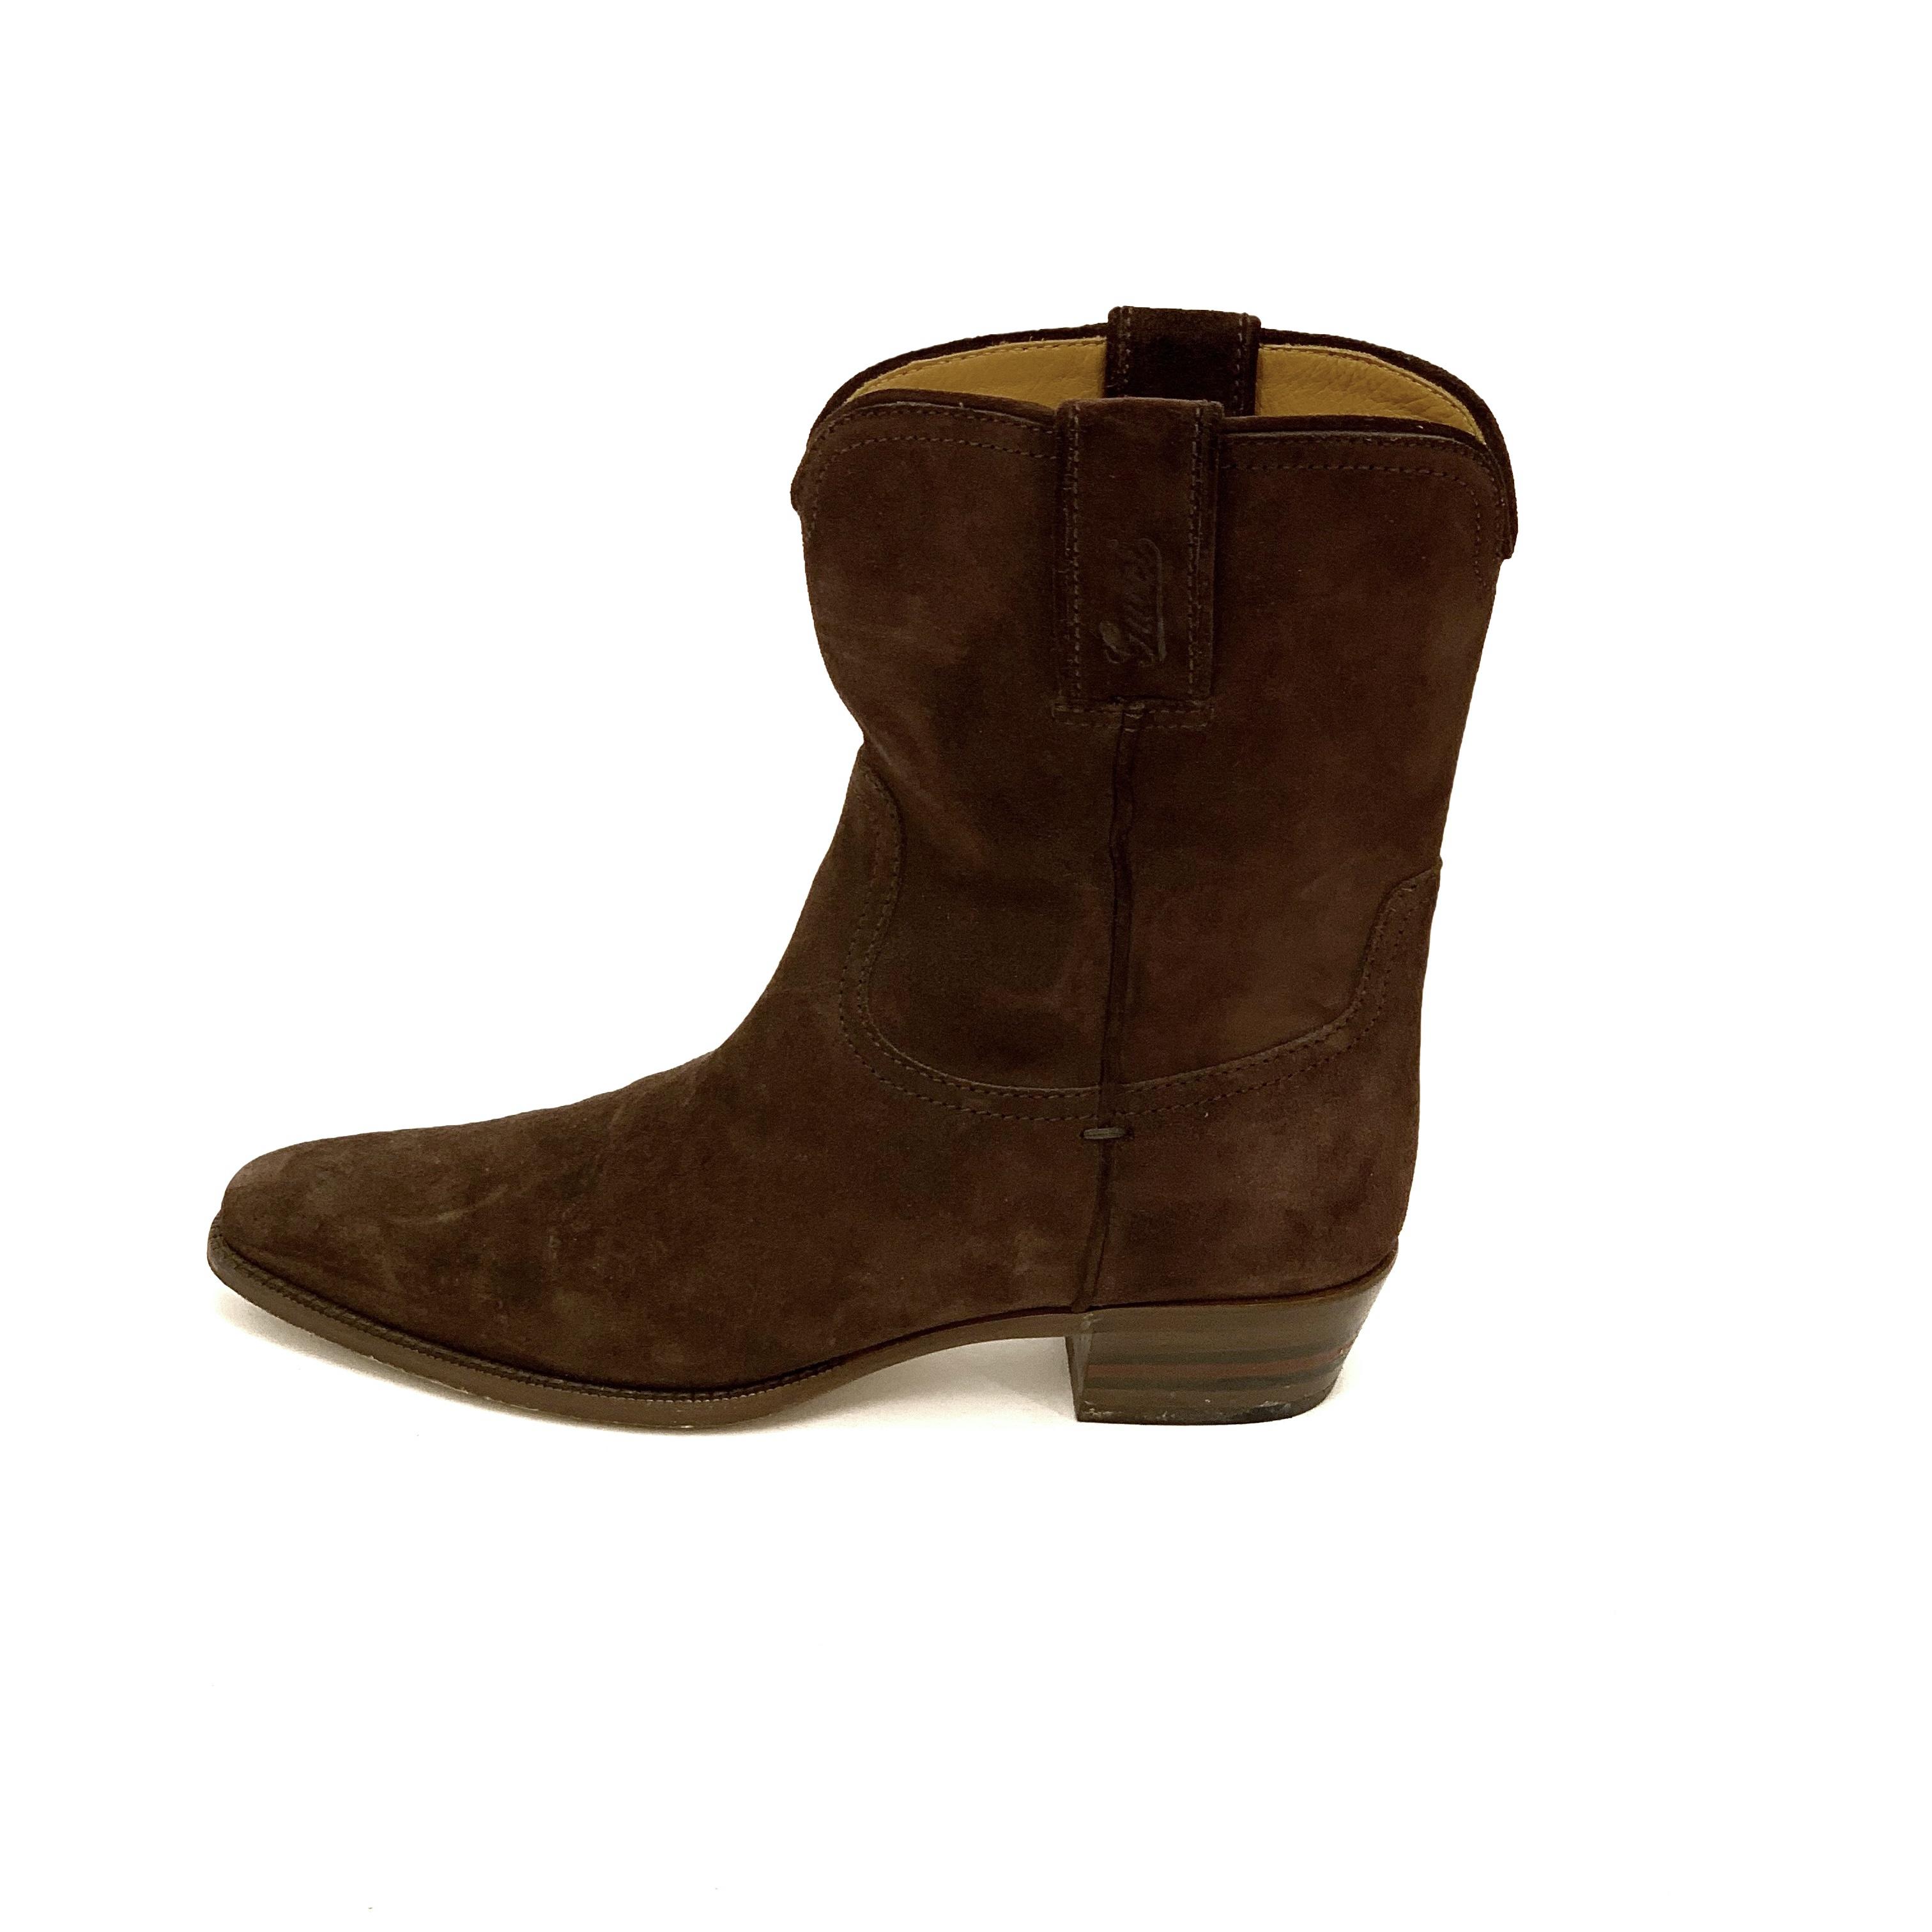 Gucci boots brun mocka 38 SV5555